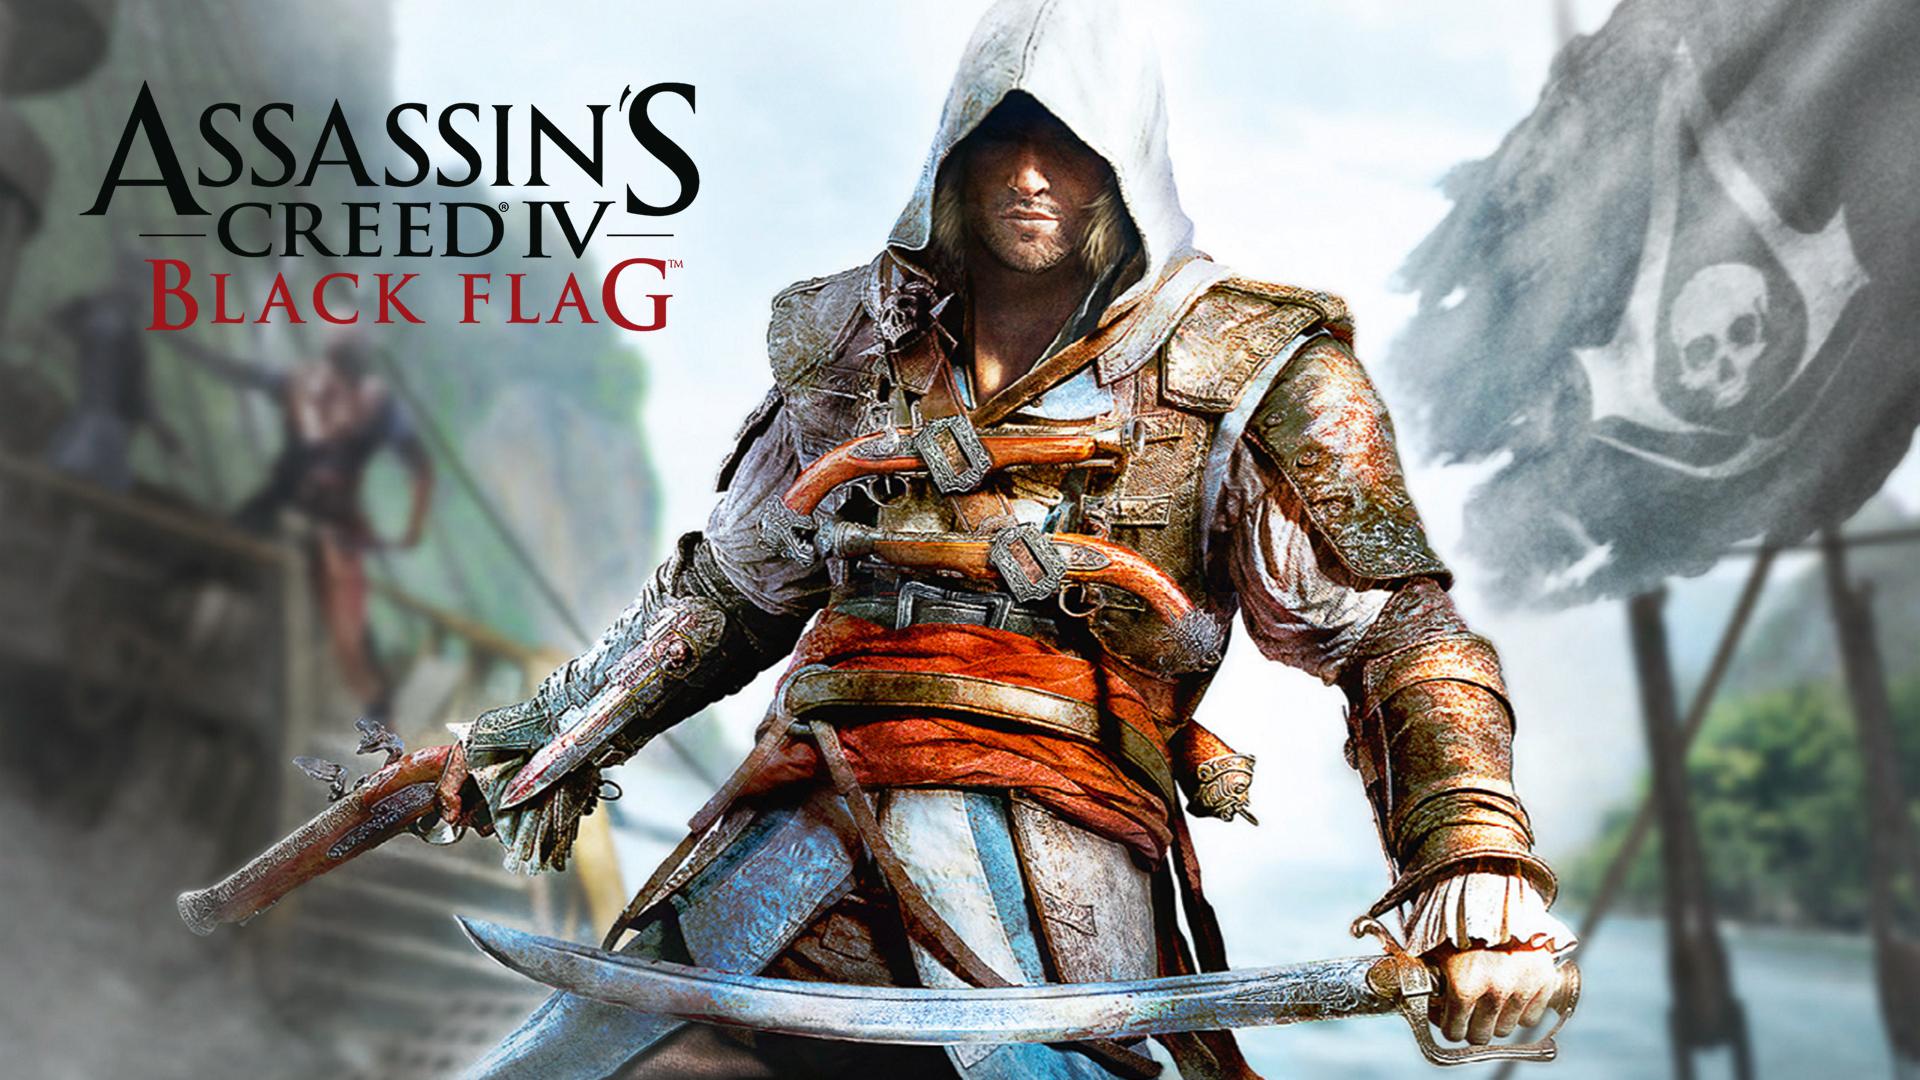 Assassins Creed Iv Black Flag Wallpaper Geekshizzle